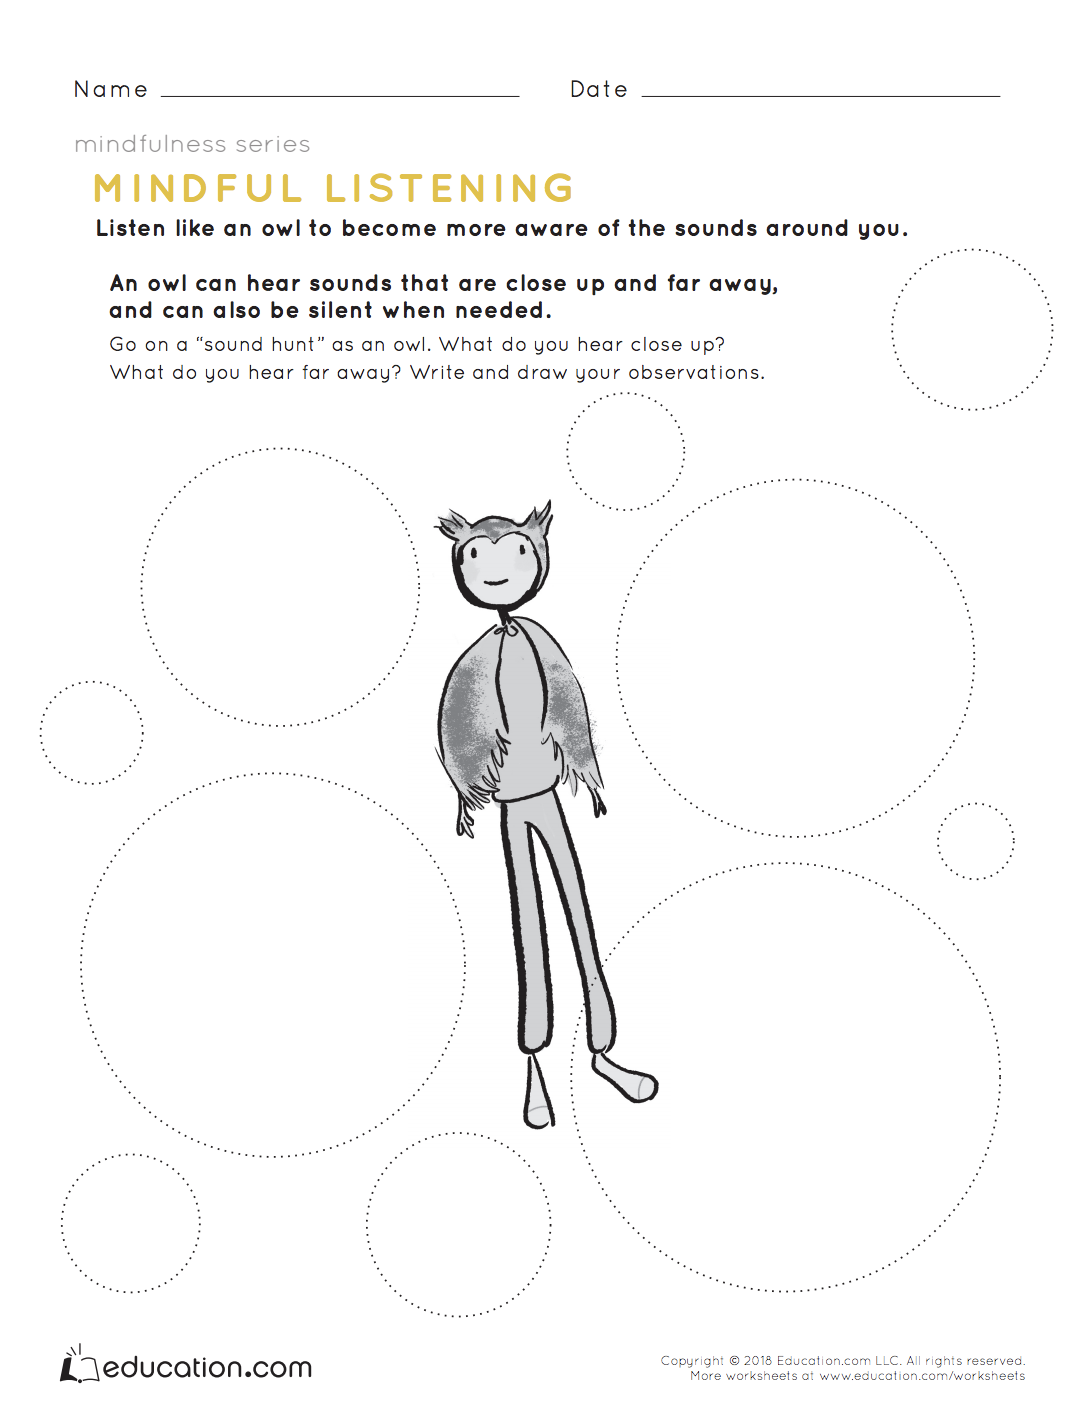 Mindfulness Mindful Listening